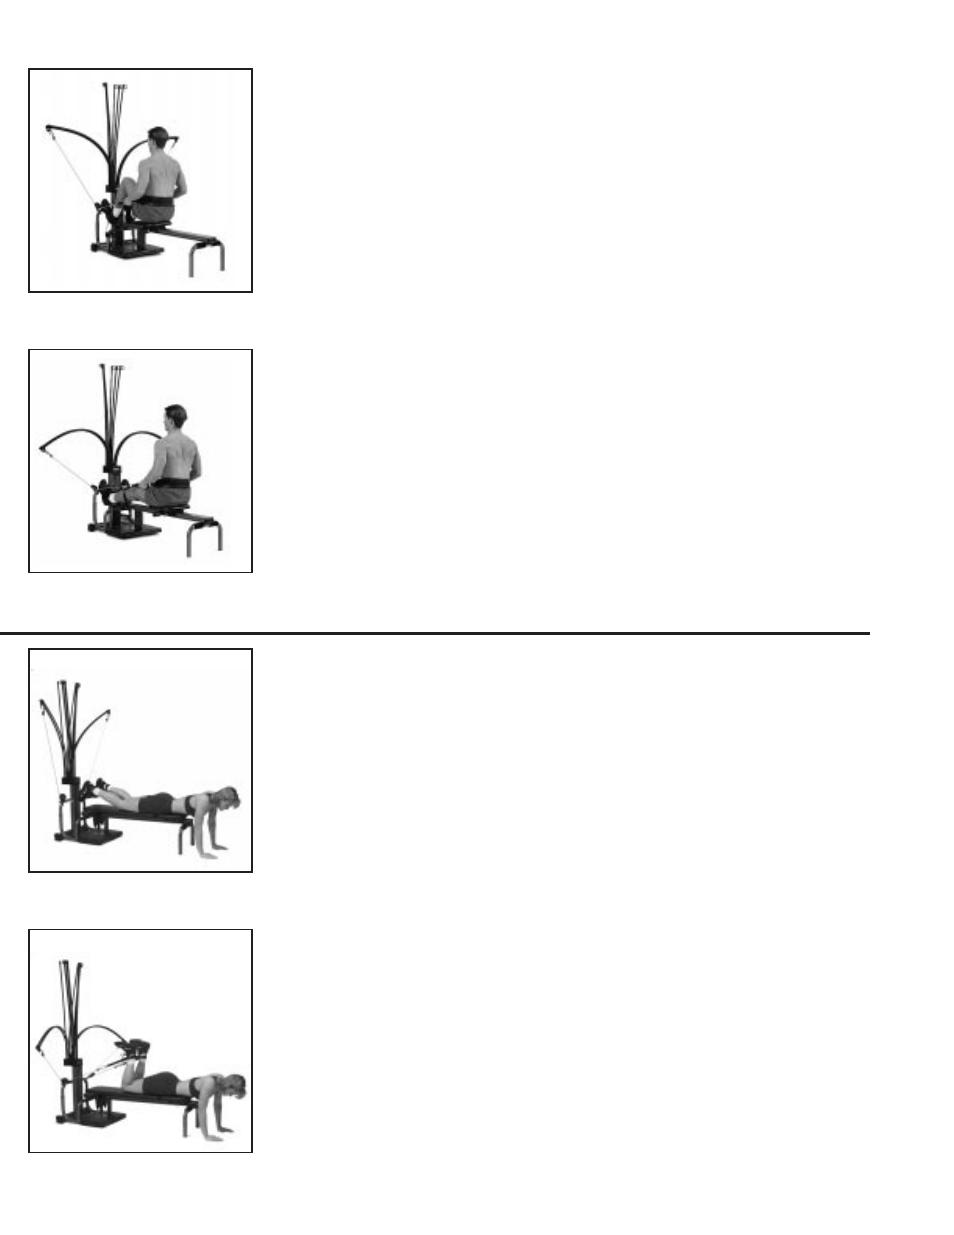 Leg Exercises Bowflex Xtl User Manual Page 48 80